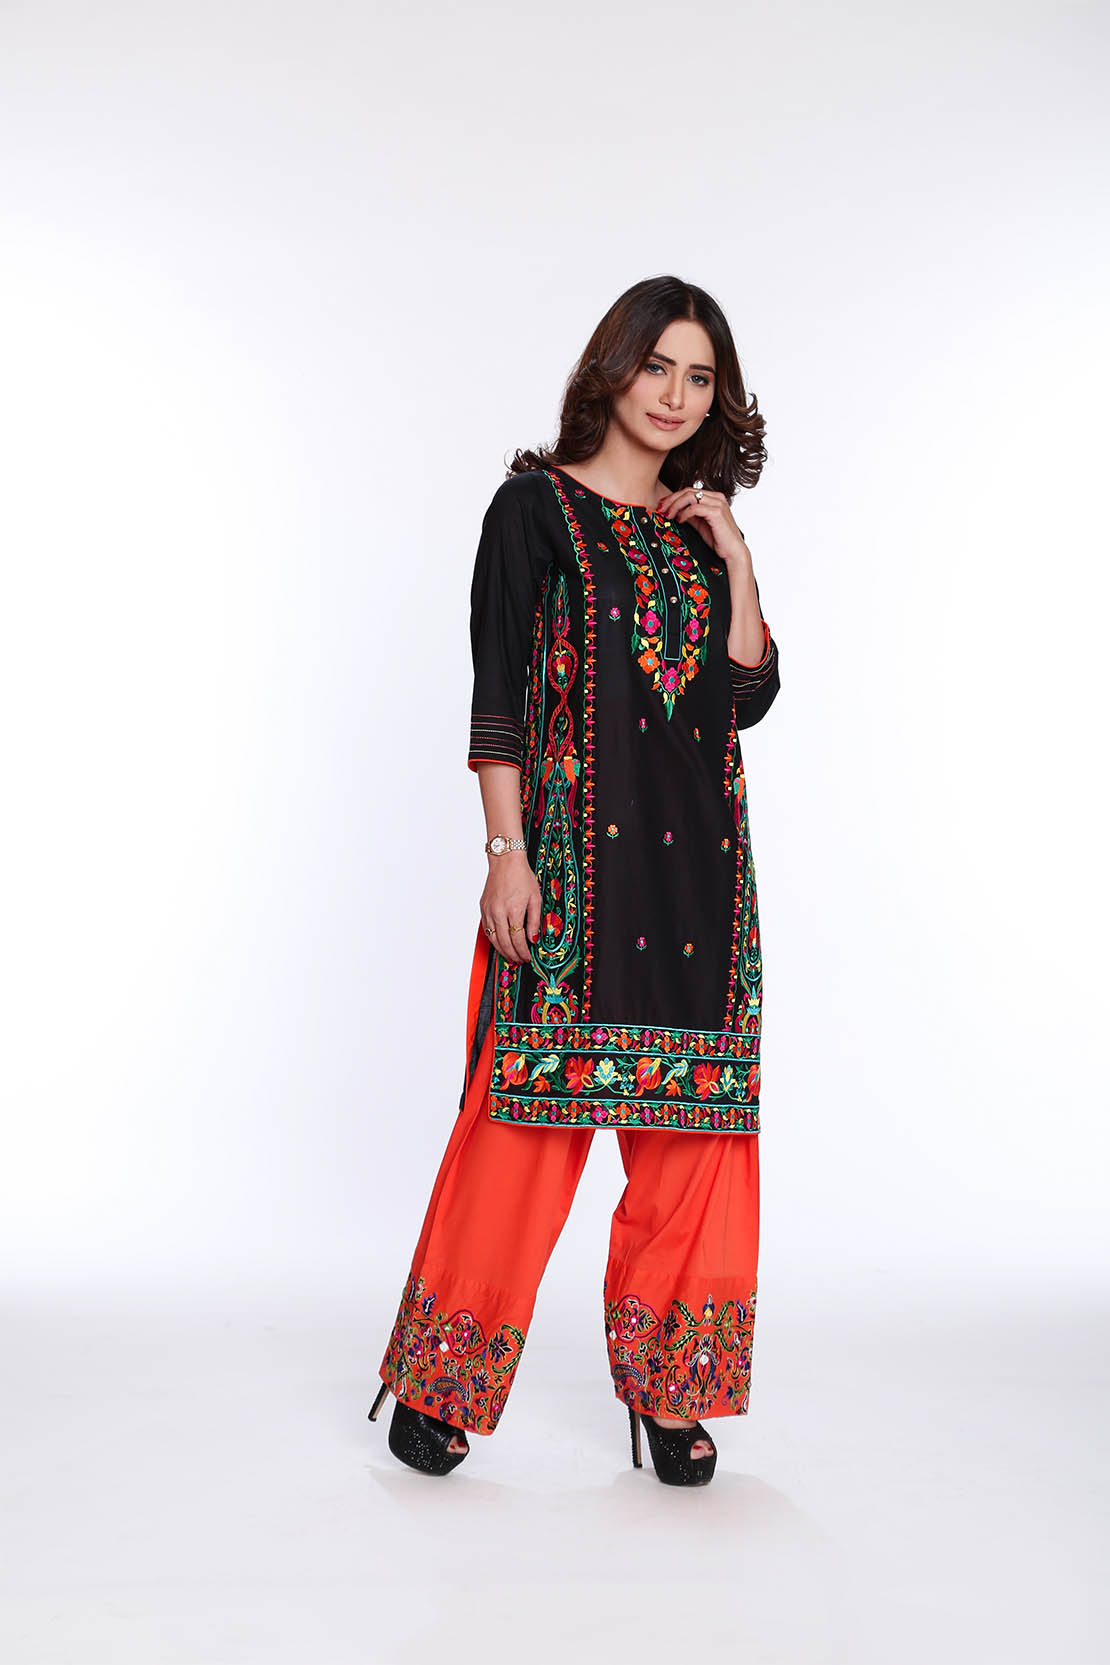 Rang Ja Trendy Eid Colorful Kurti Dresses 2017-2018 Collection